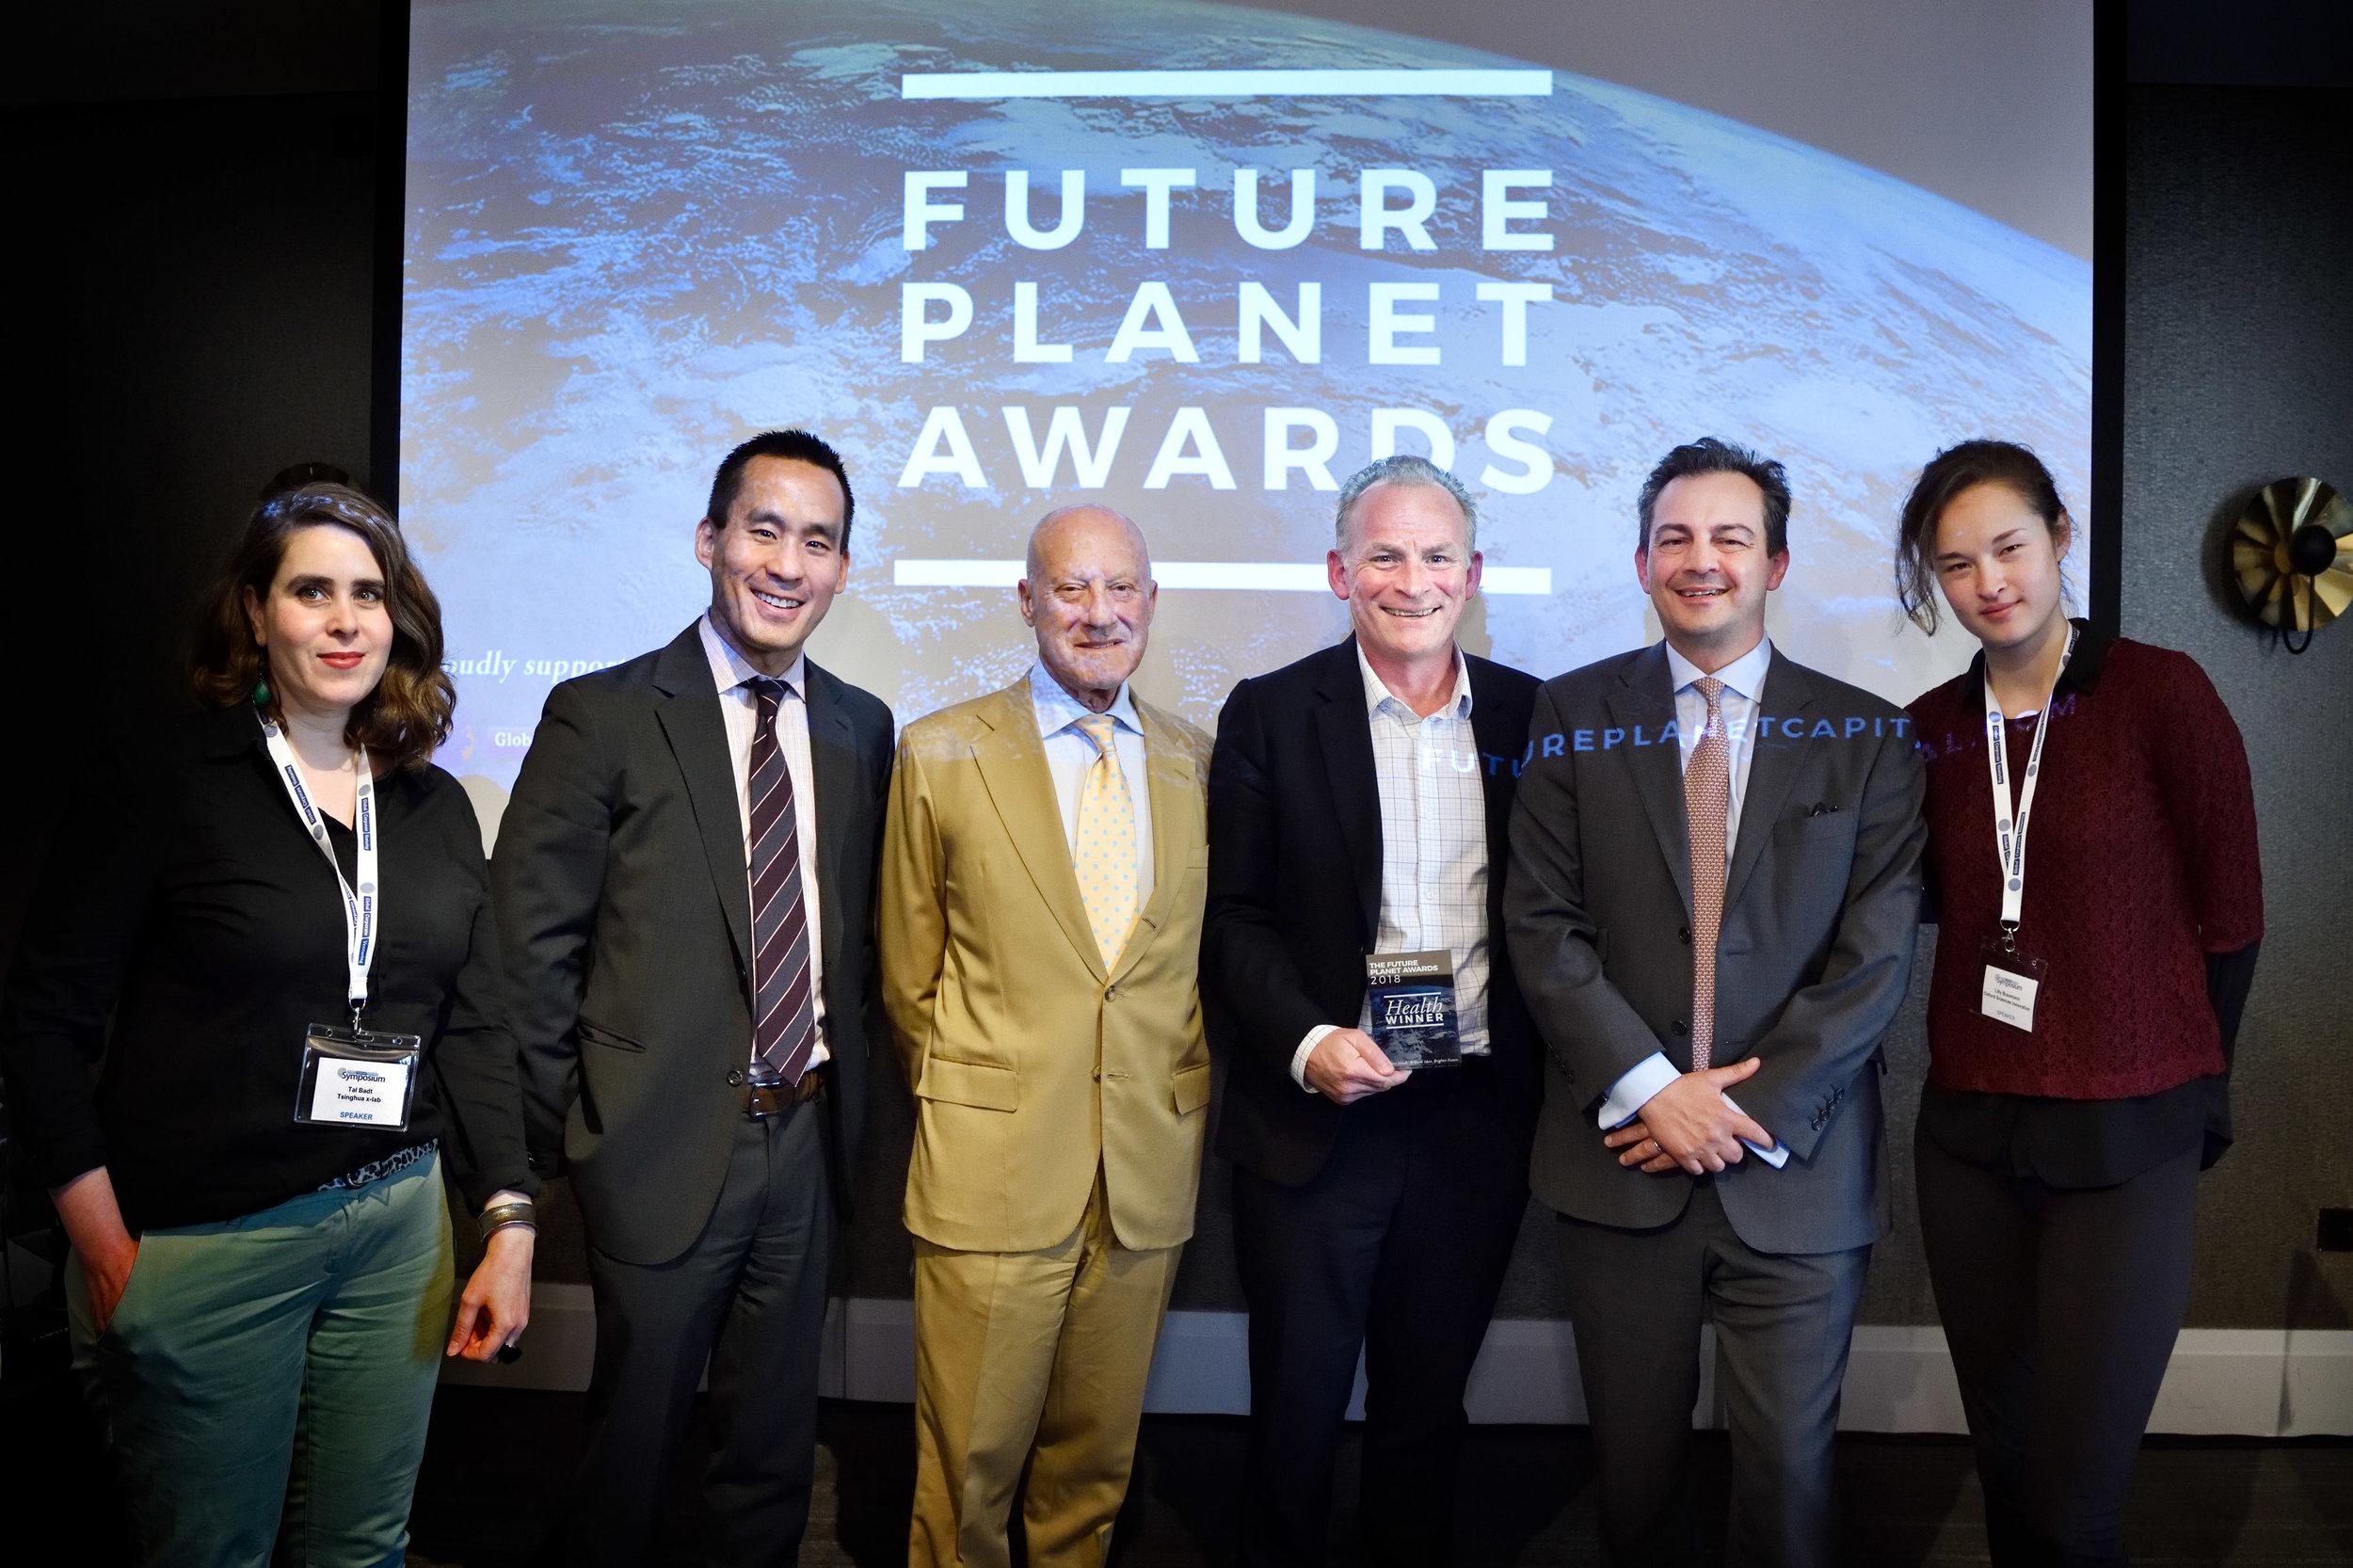 BvOF 2018_0522_BOU - Global Corporate Venturing Symposium - Future Planet Awards.jpg